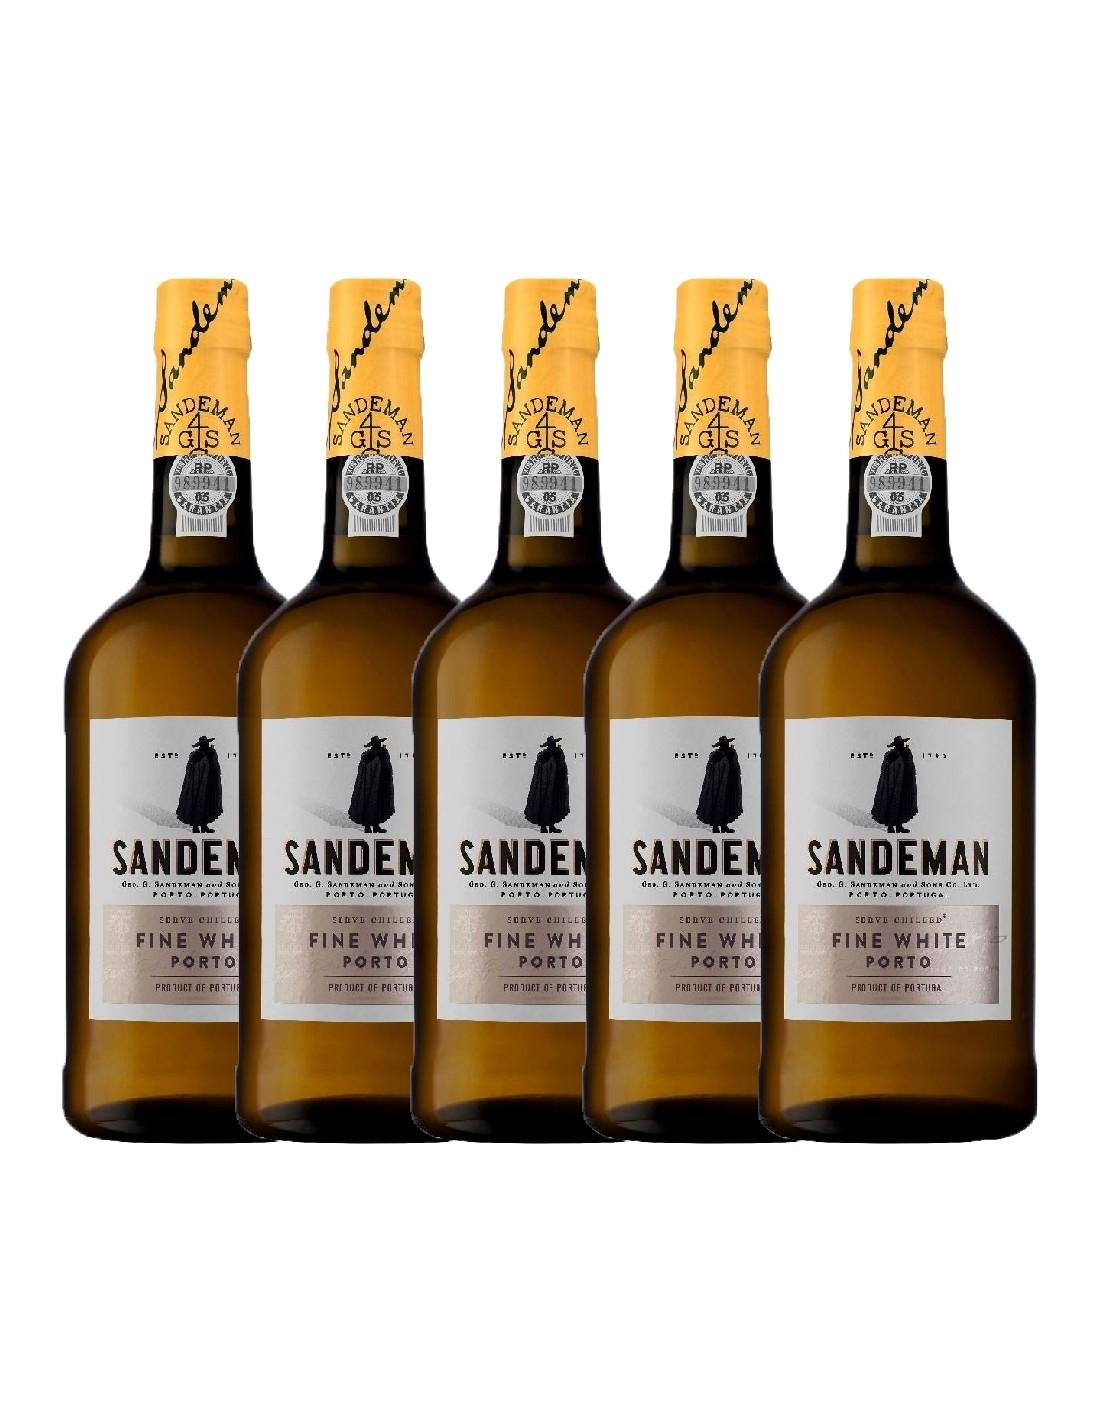 Pachet 5 sticle Vin porto alb, Cupaj, Sandeman White Porto, 0.75L, 19.5% alc., Portugalia